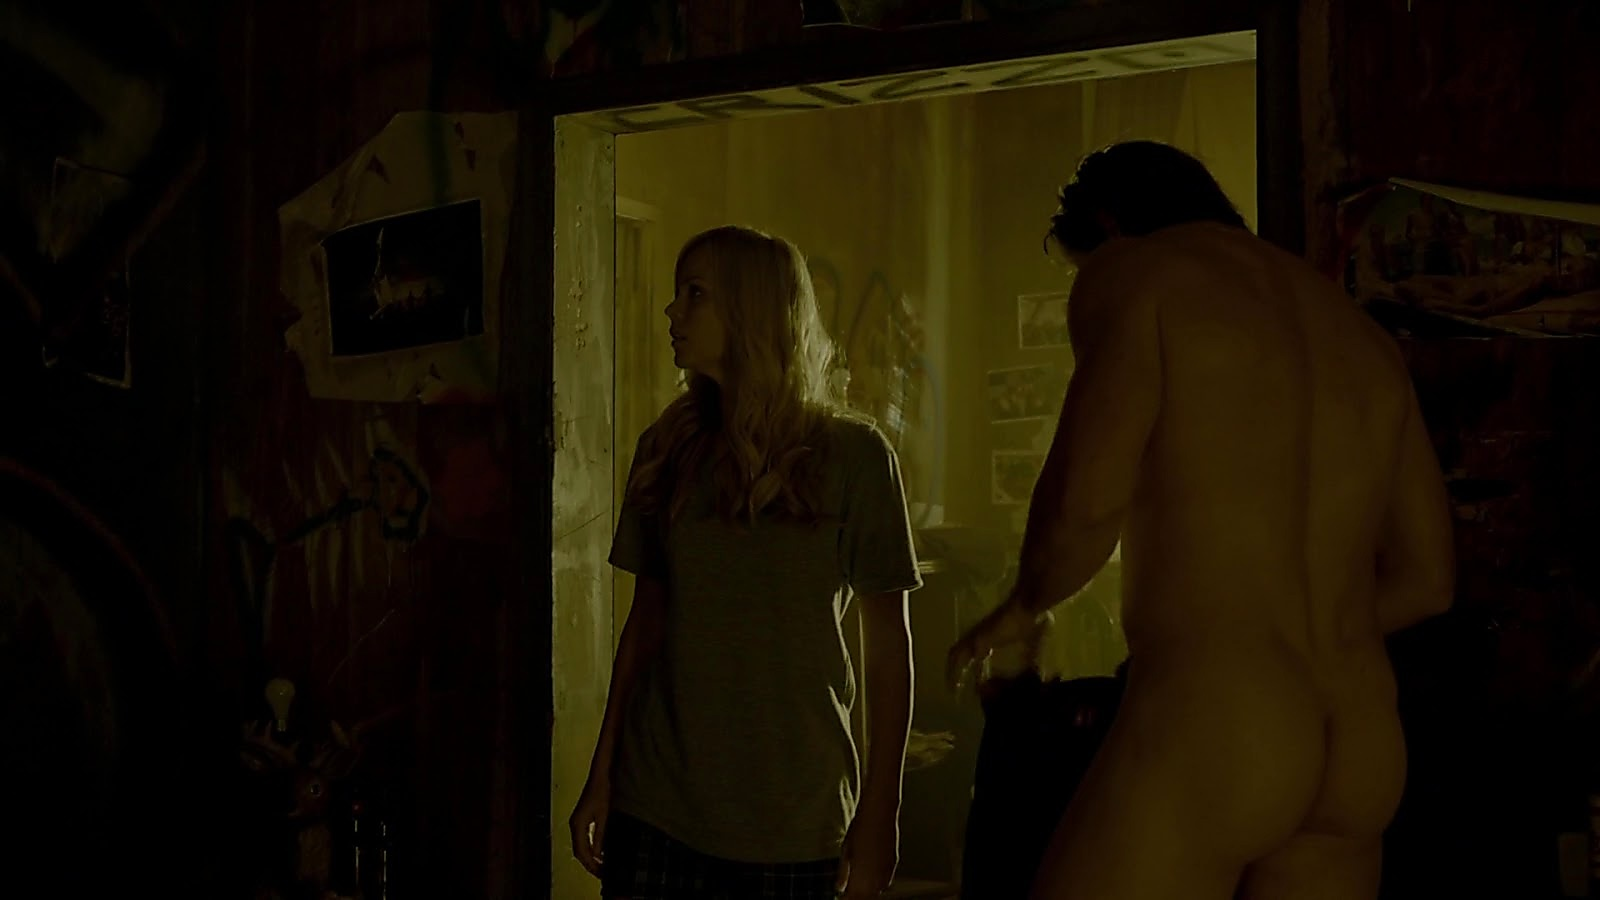 Greyston Holt sexy shirtless scene April 8, 2020, 5am